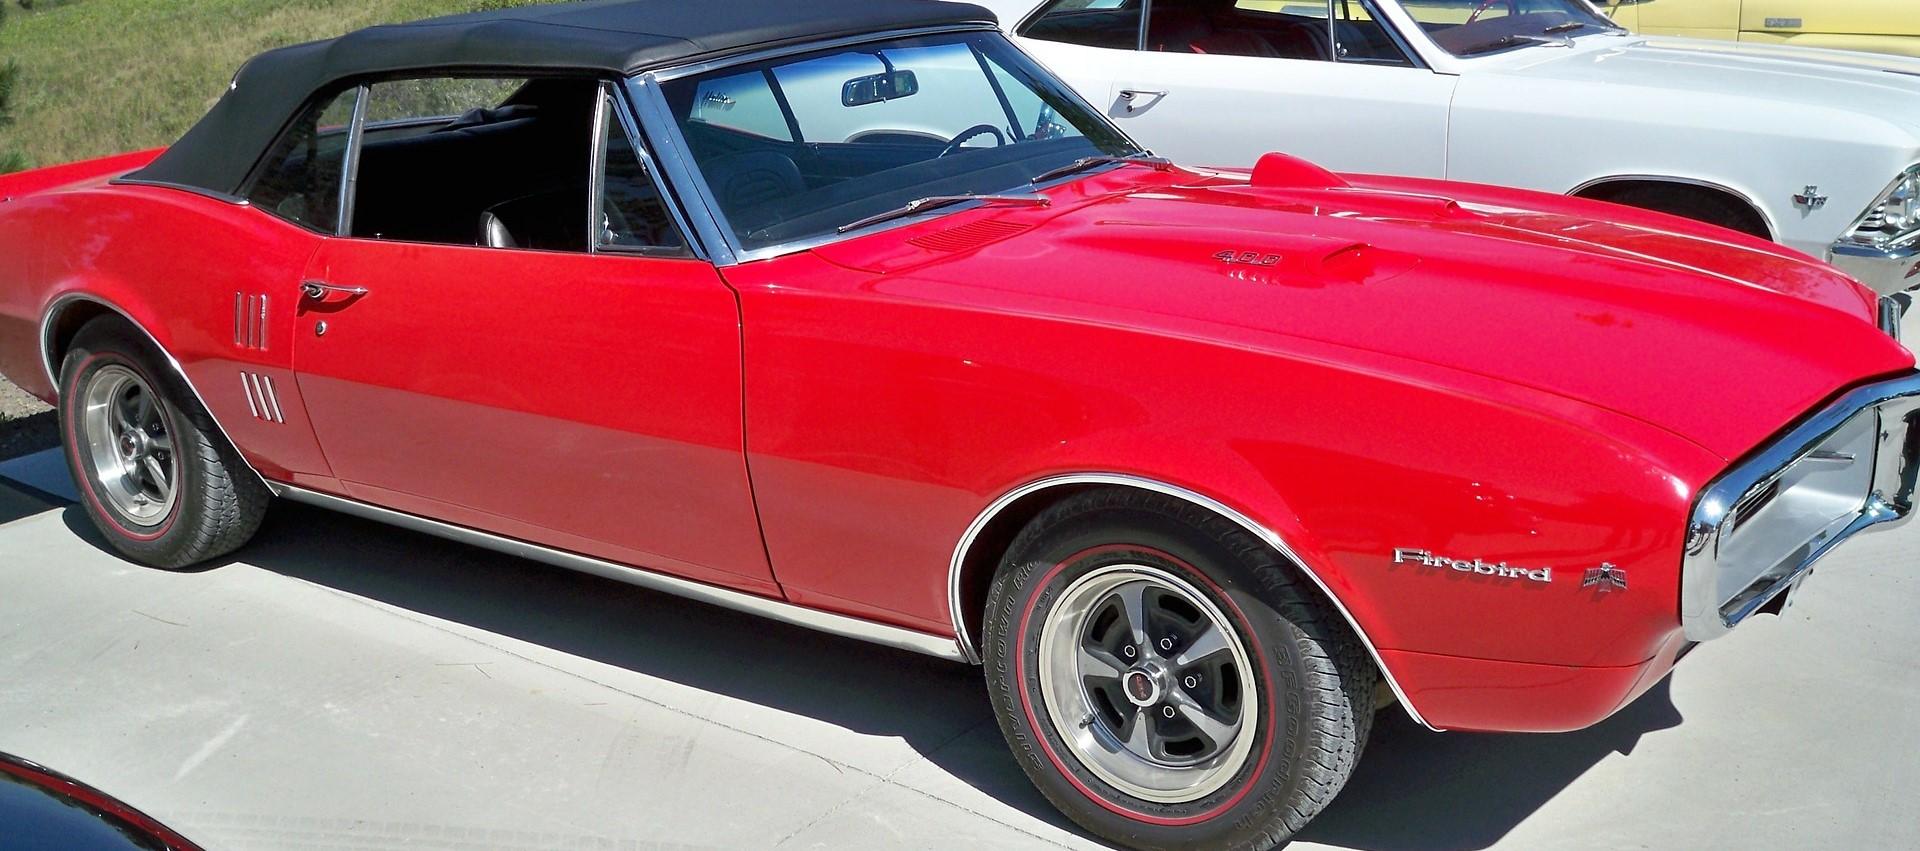 Classic Firebird in Cupertino, California | Breast Cancer Car Donations